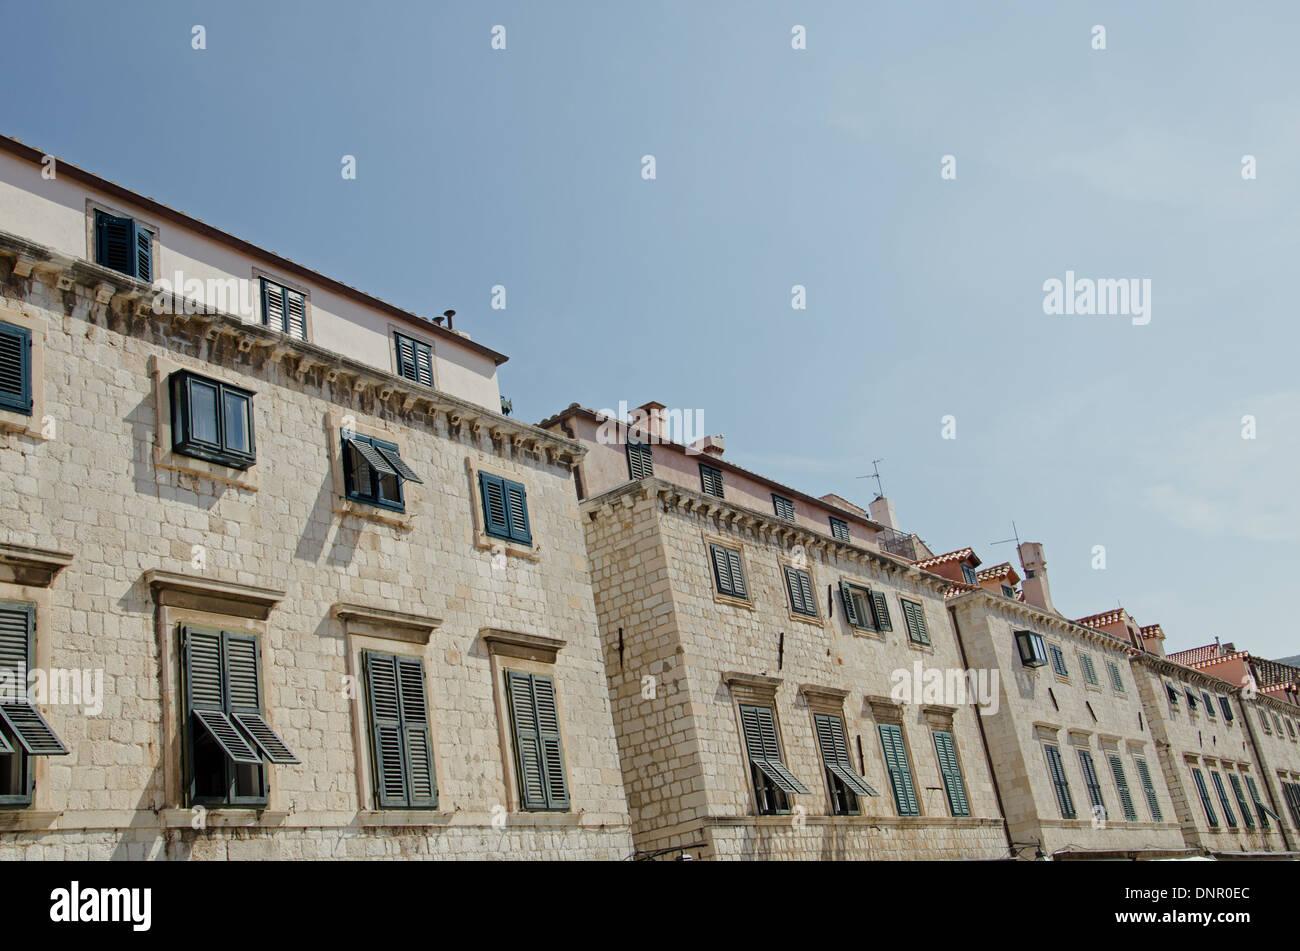 a facade in Dubrovnik - Stock Image